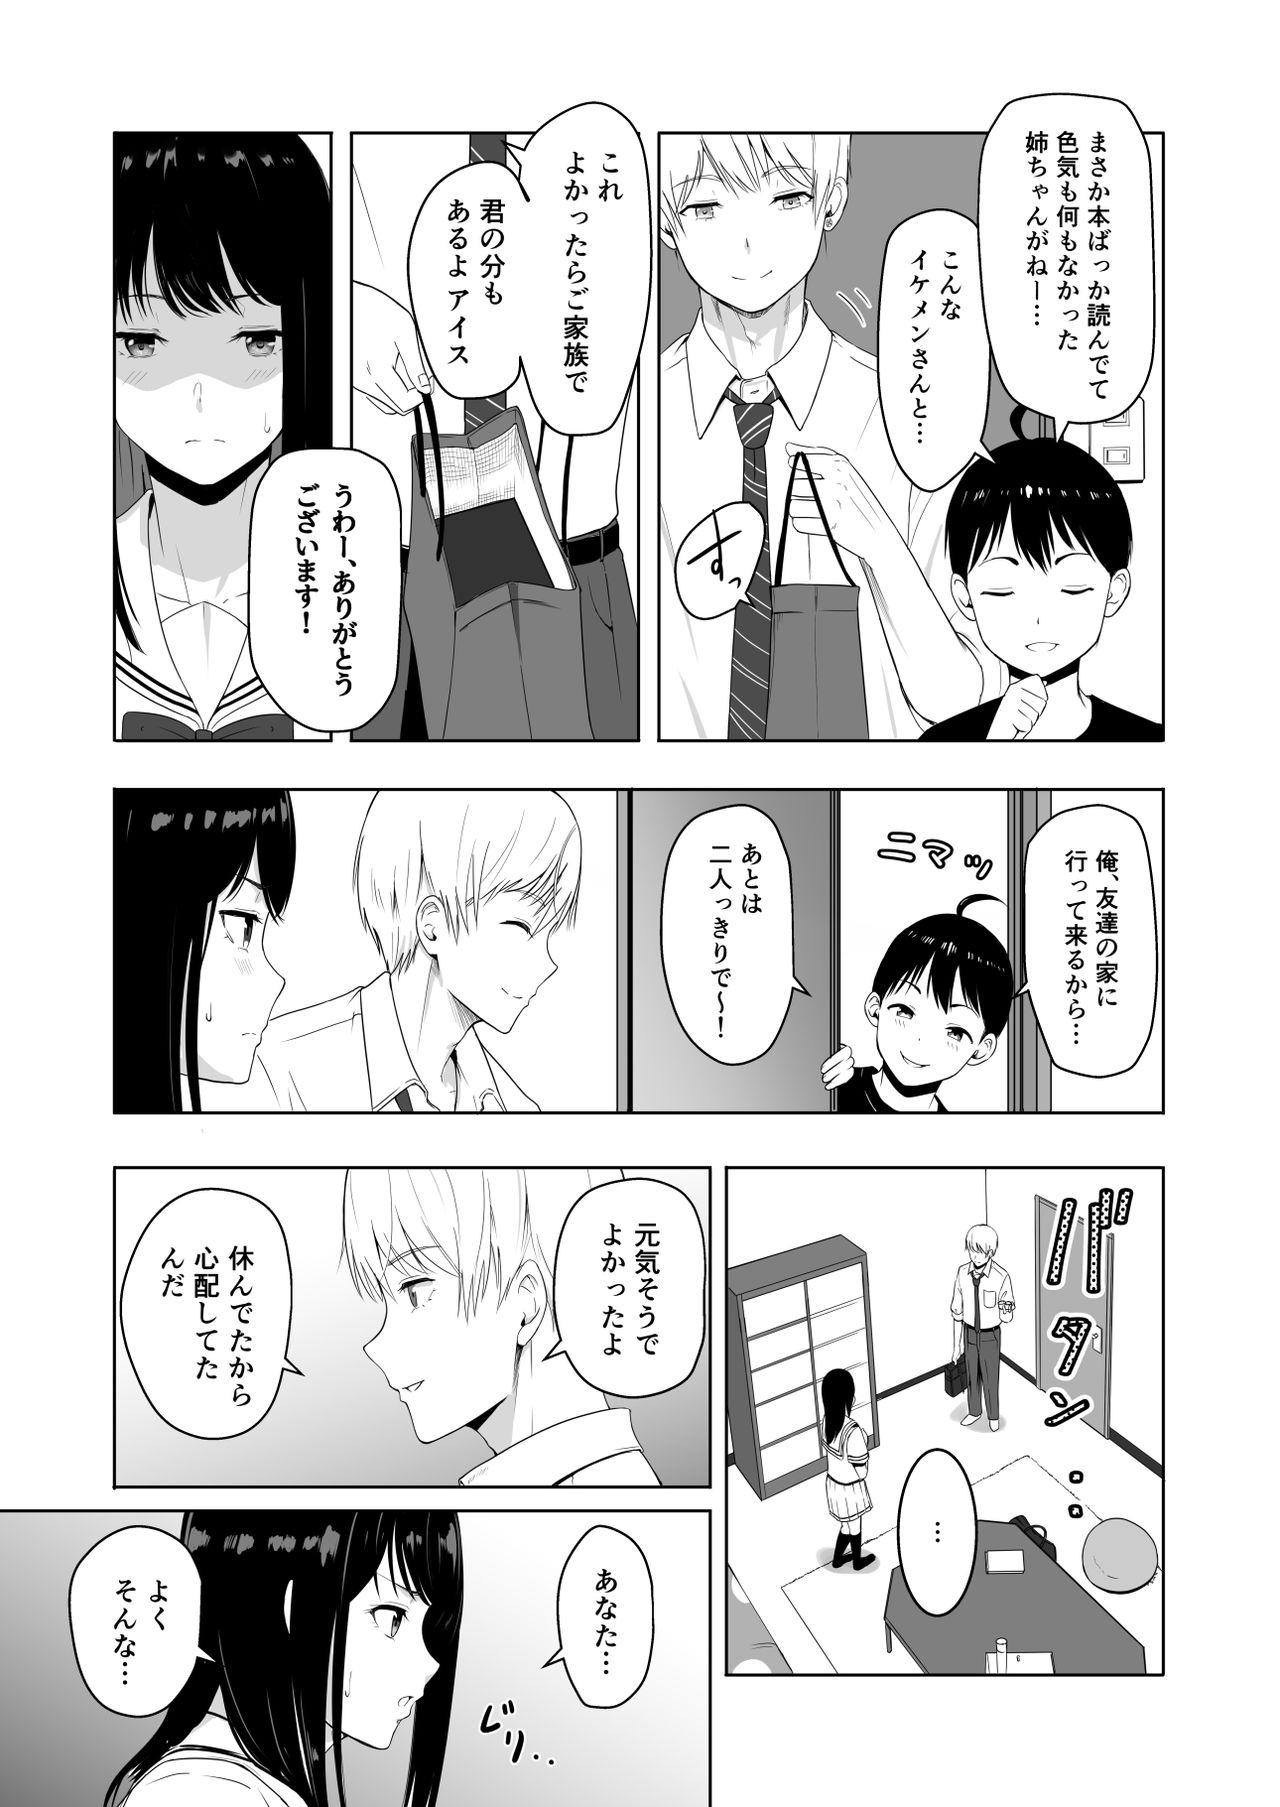 Kimi ga Tame. 2 Ichikawa Inori 37